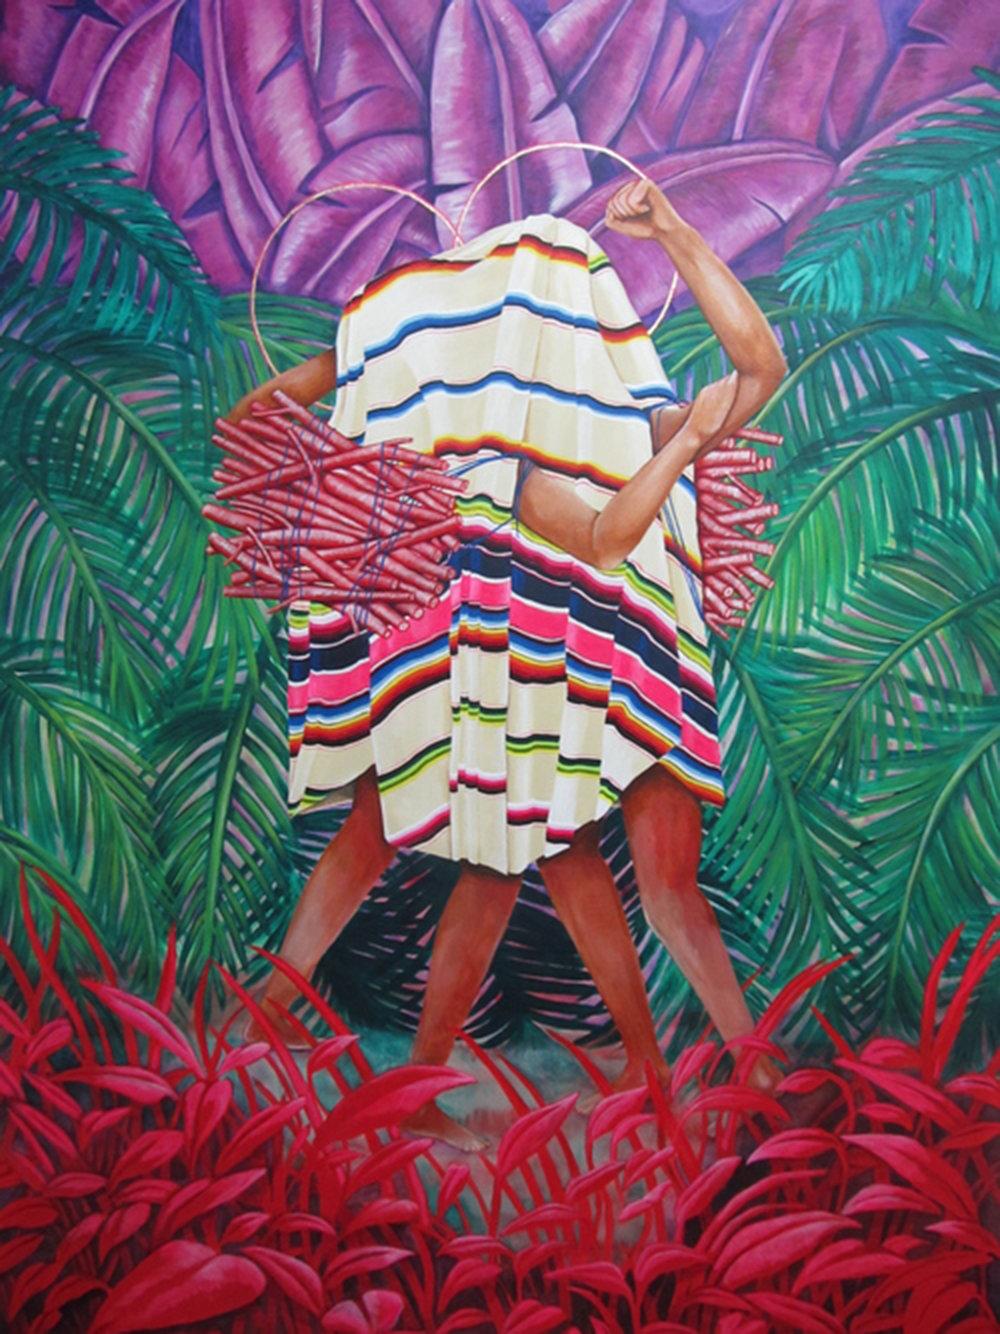 Underneath it all,  2015 Acrylic, oil paint, gold leaf on canvas, 122cm x 168cm